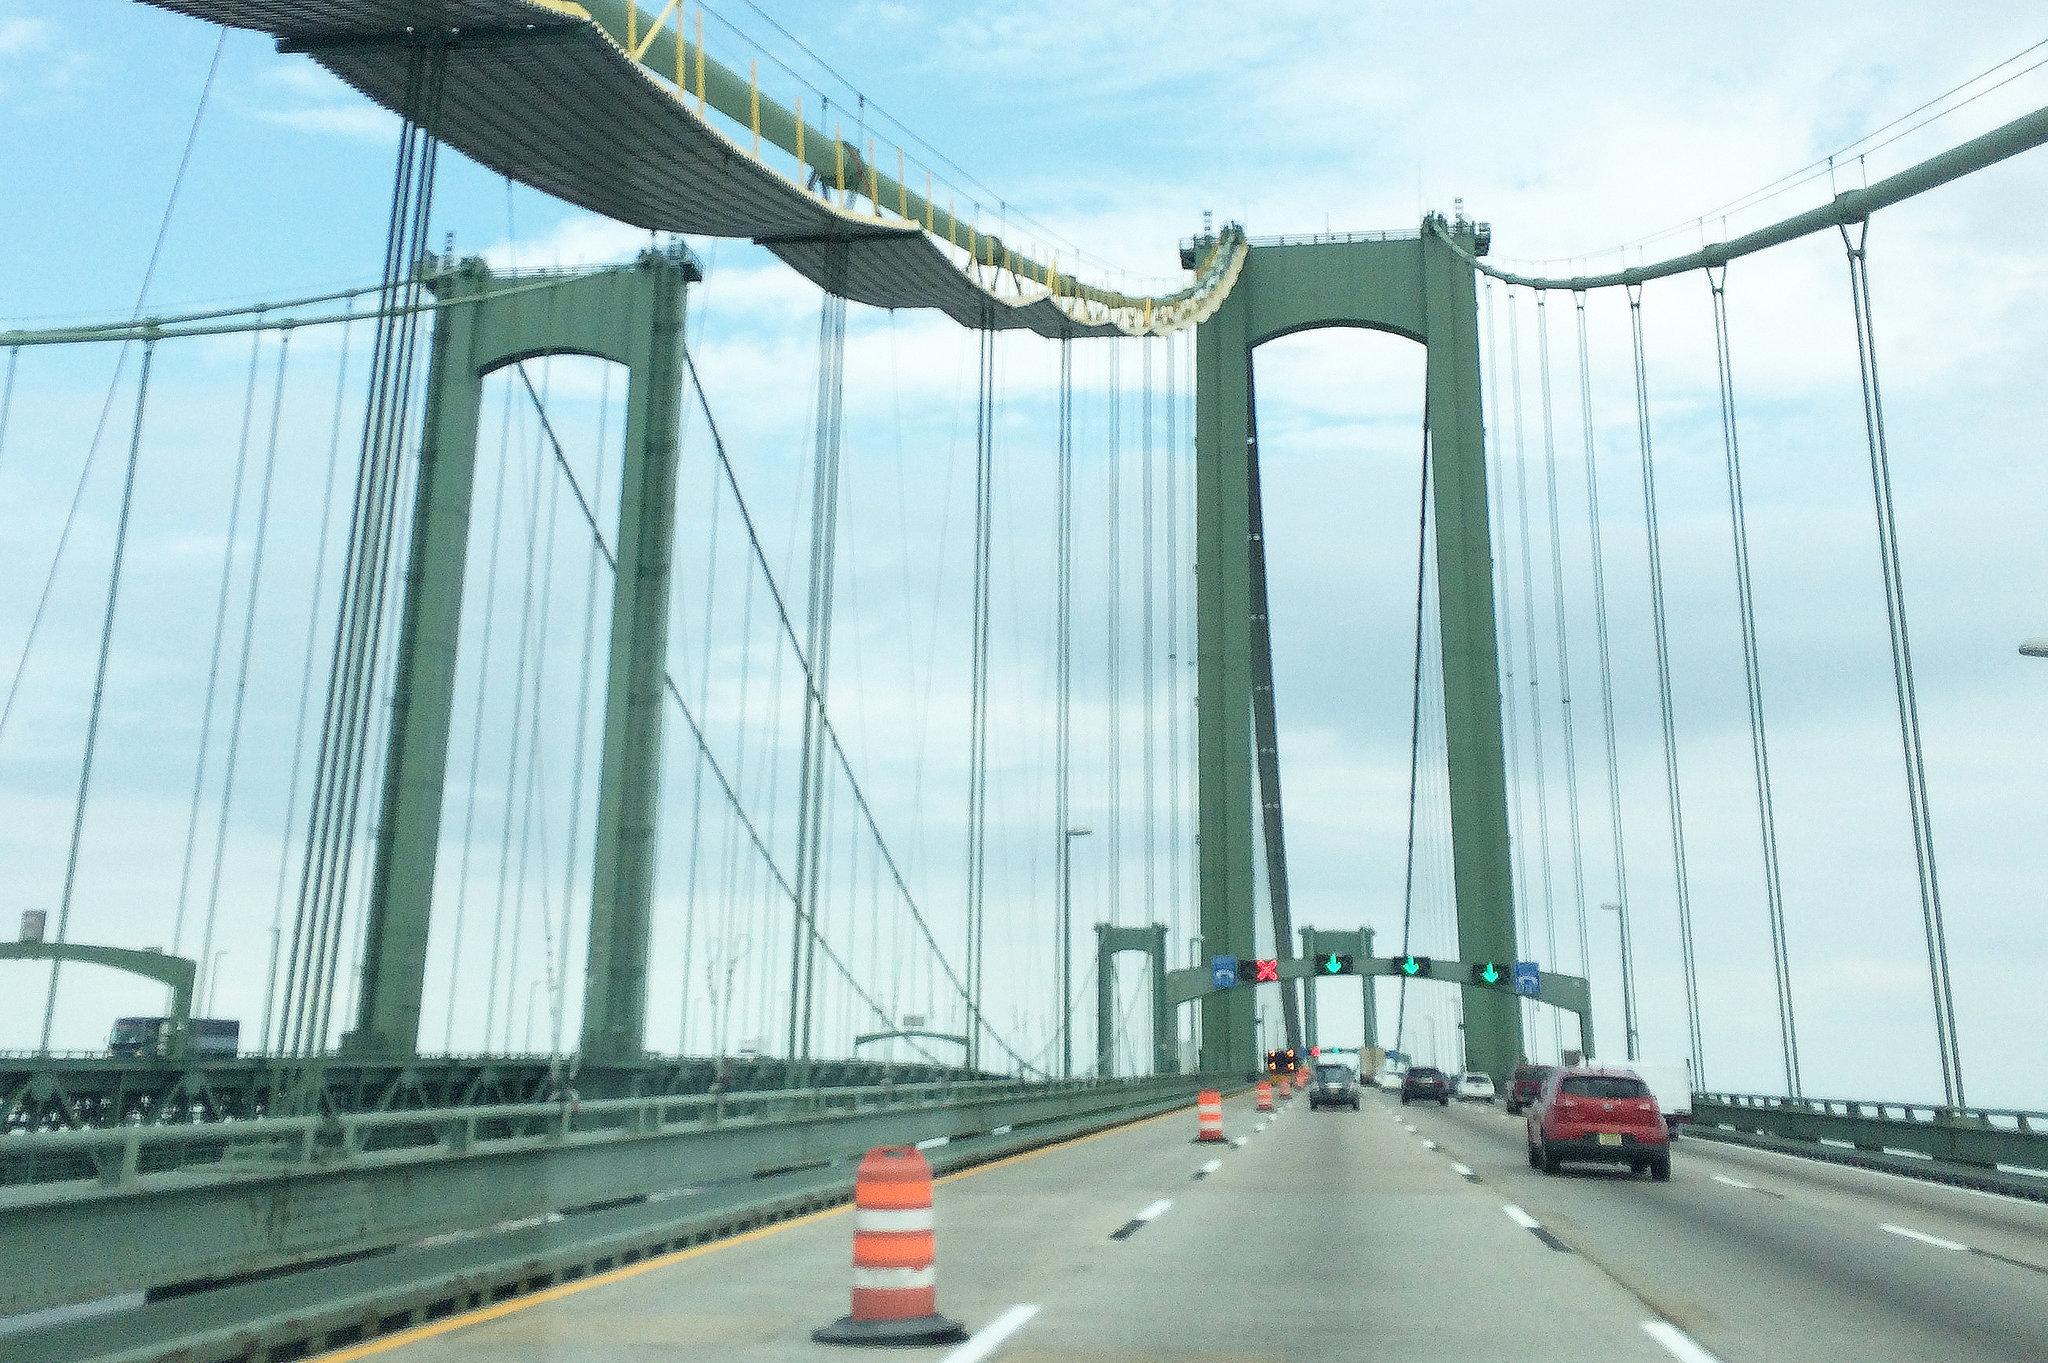 Why both spans of Delaware Memorial Bridge will shut down | NJ.com